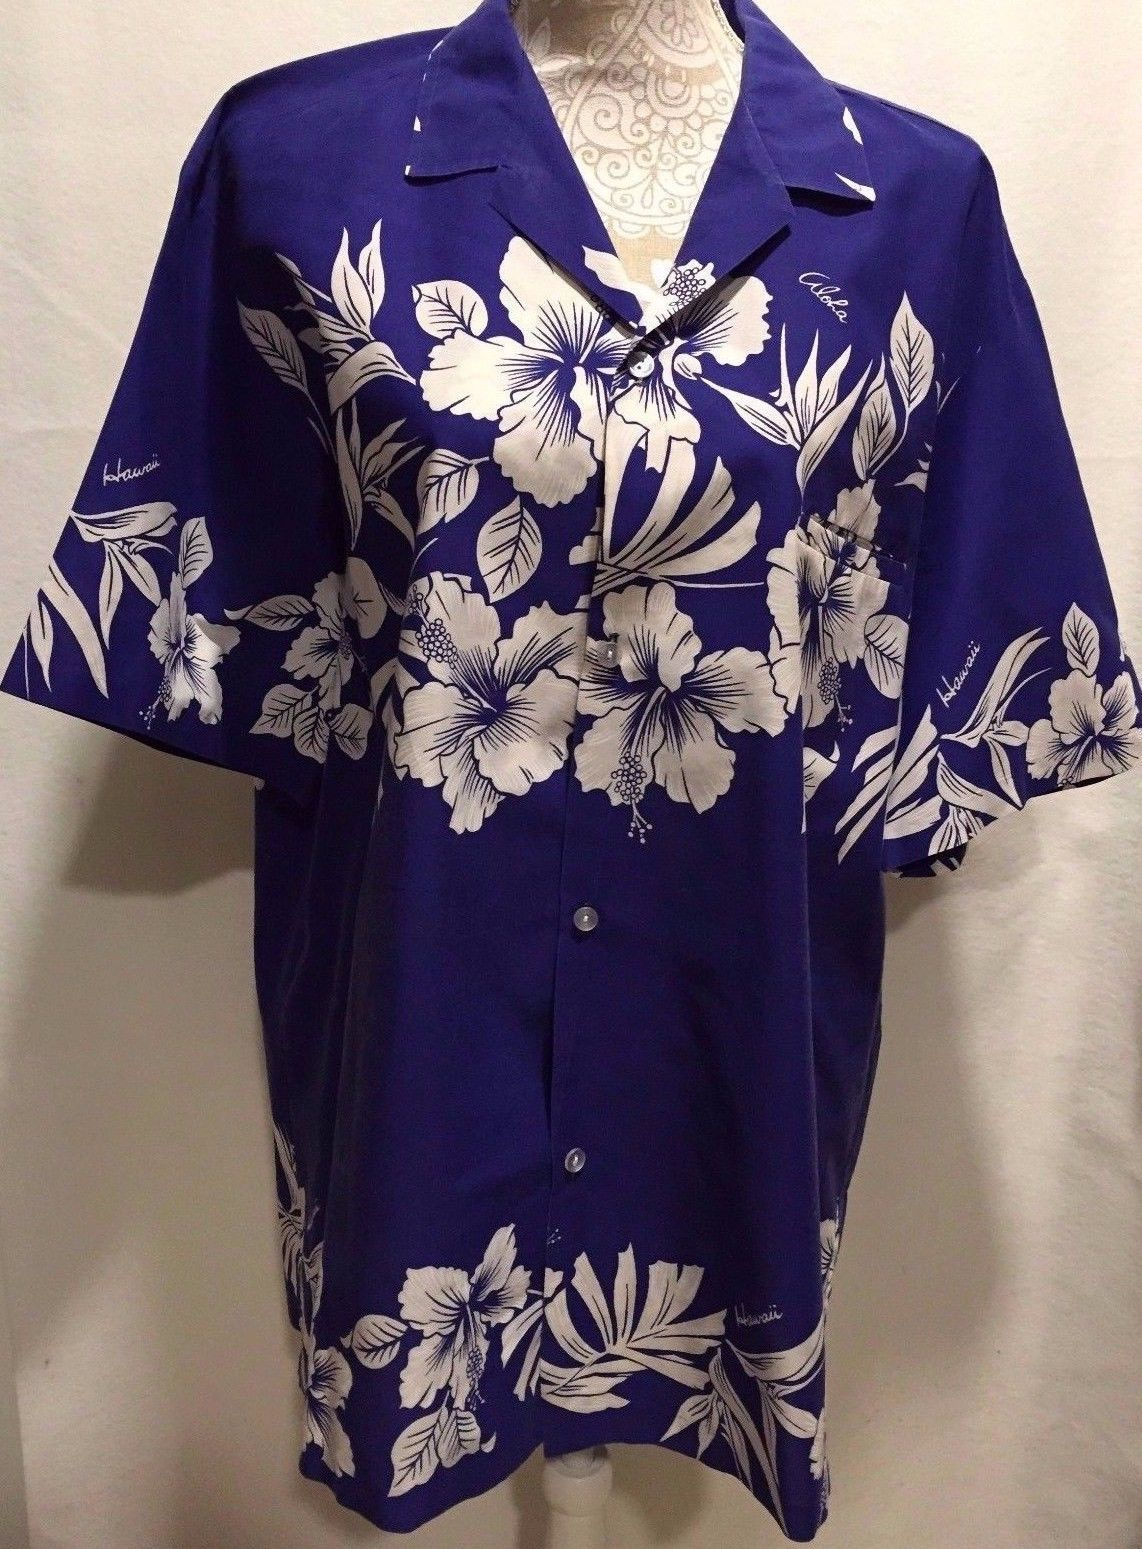 Creations Hawaii Large Hawaiian Aloha Shirt Floral Blue White MADE IN HAWAII XL